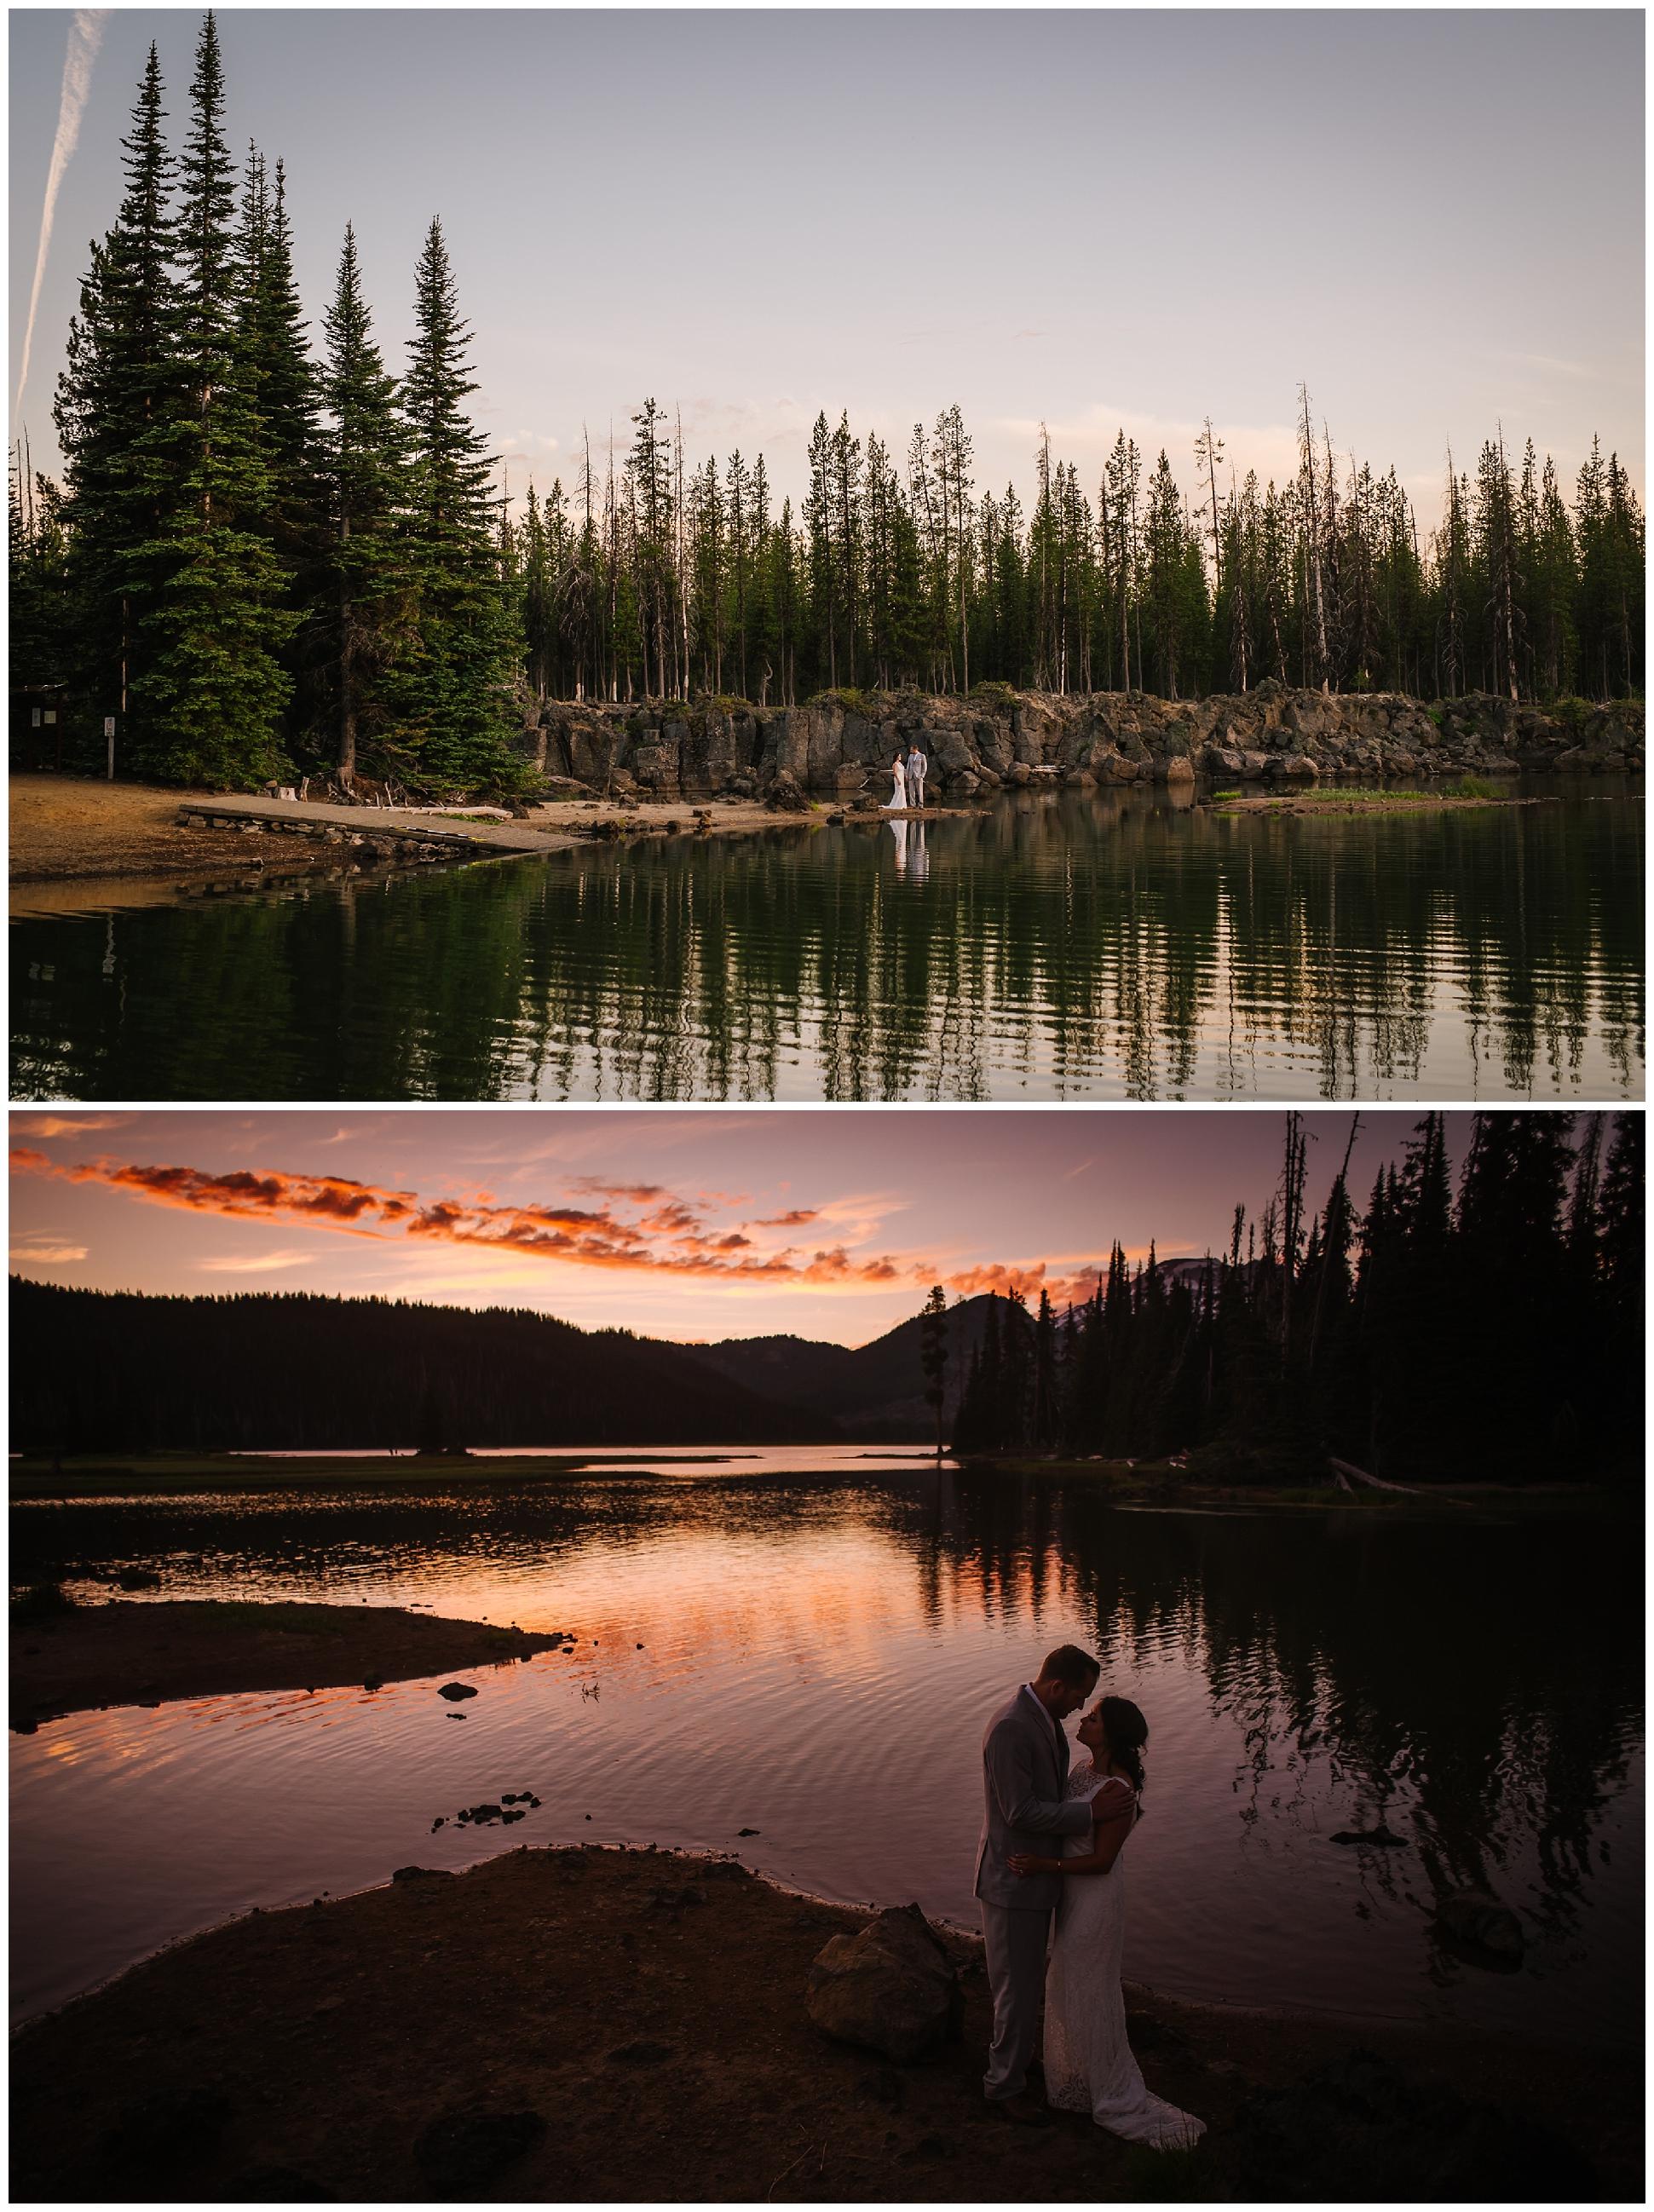 Ashlee-hamon-photography-year-in-review-2016-travel-wanderlust-vsco-adventure-wedding_0056.jpg